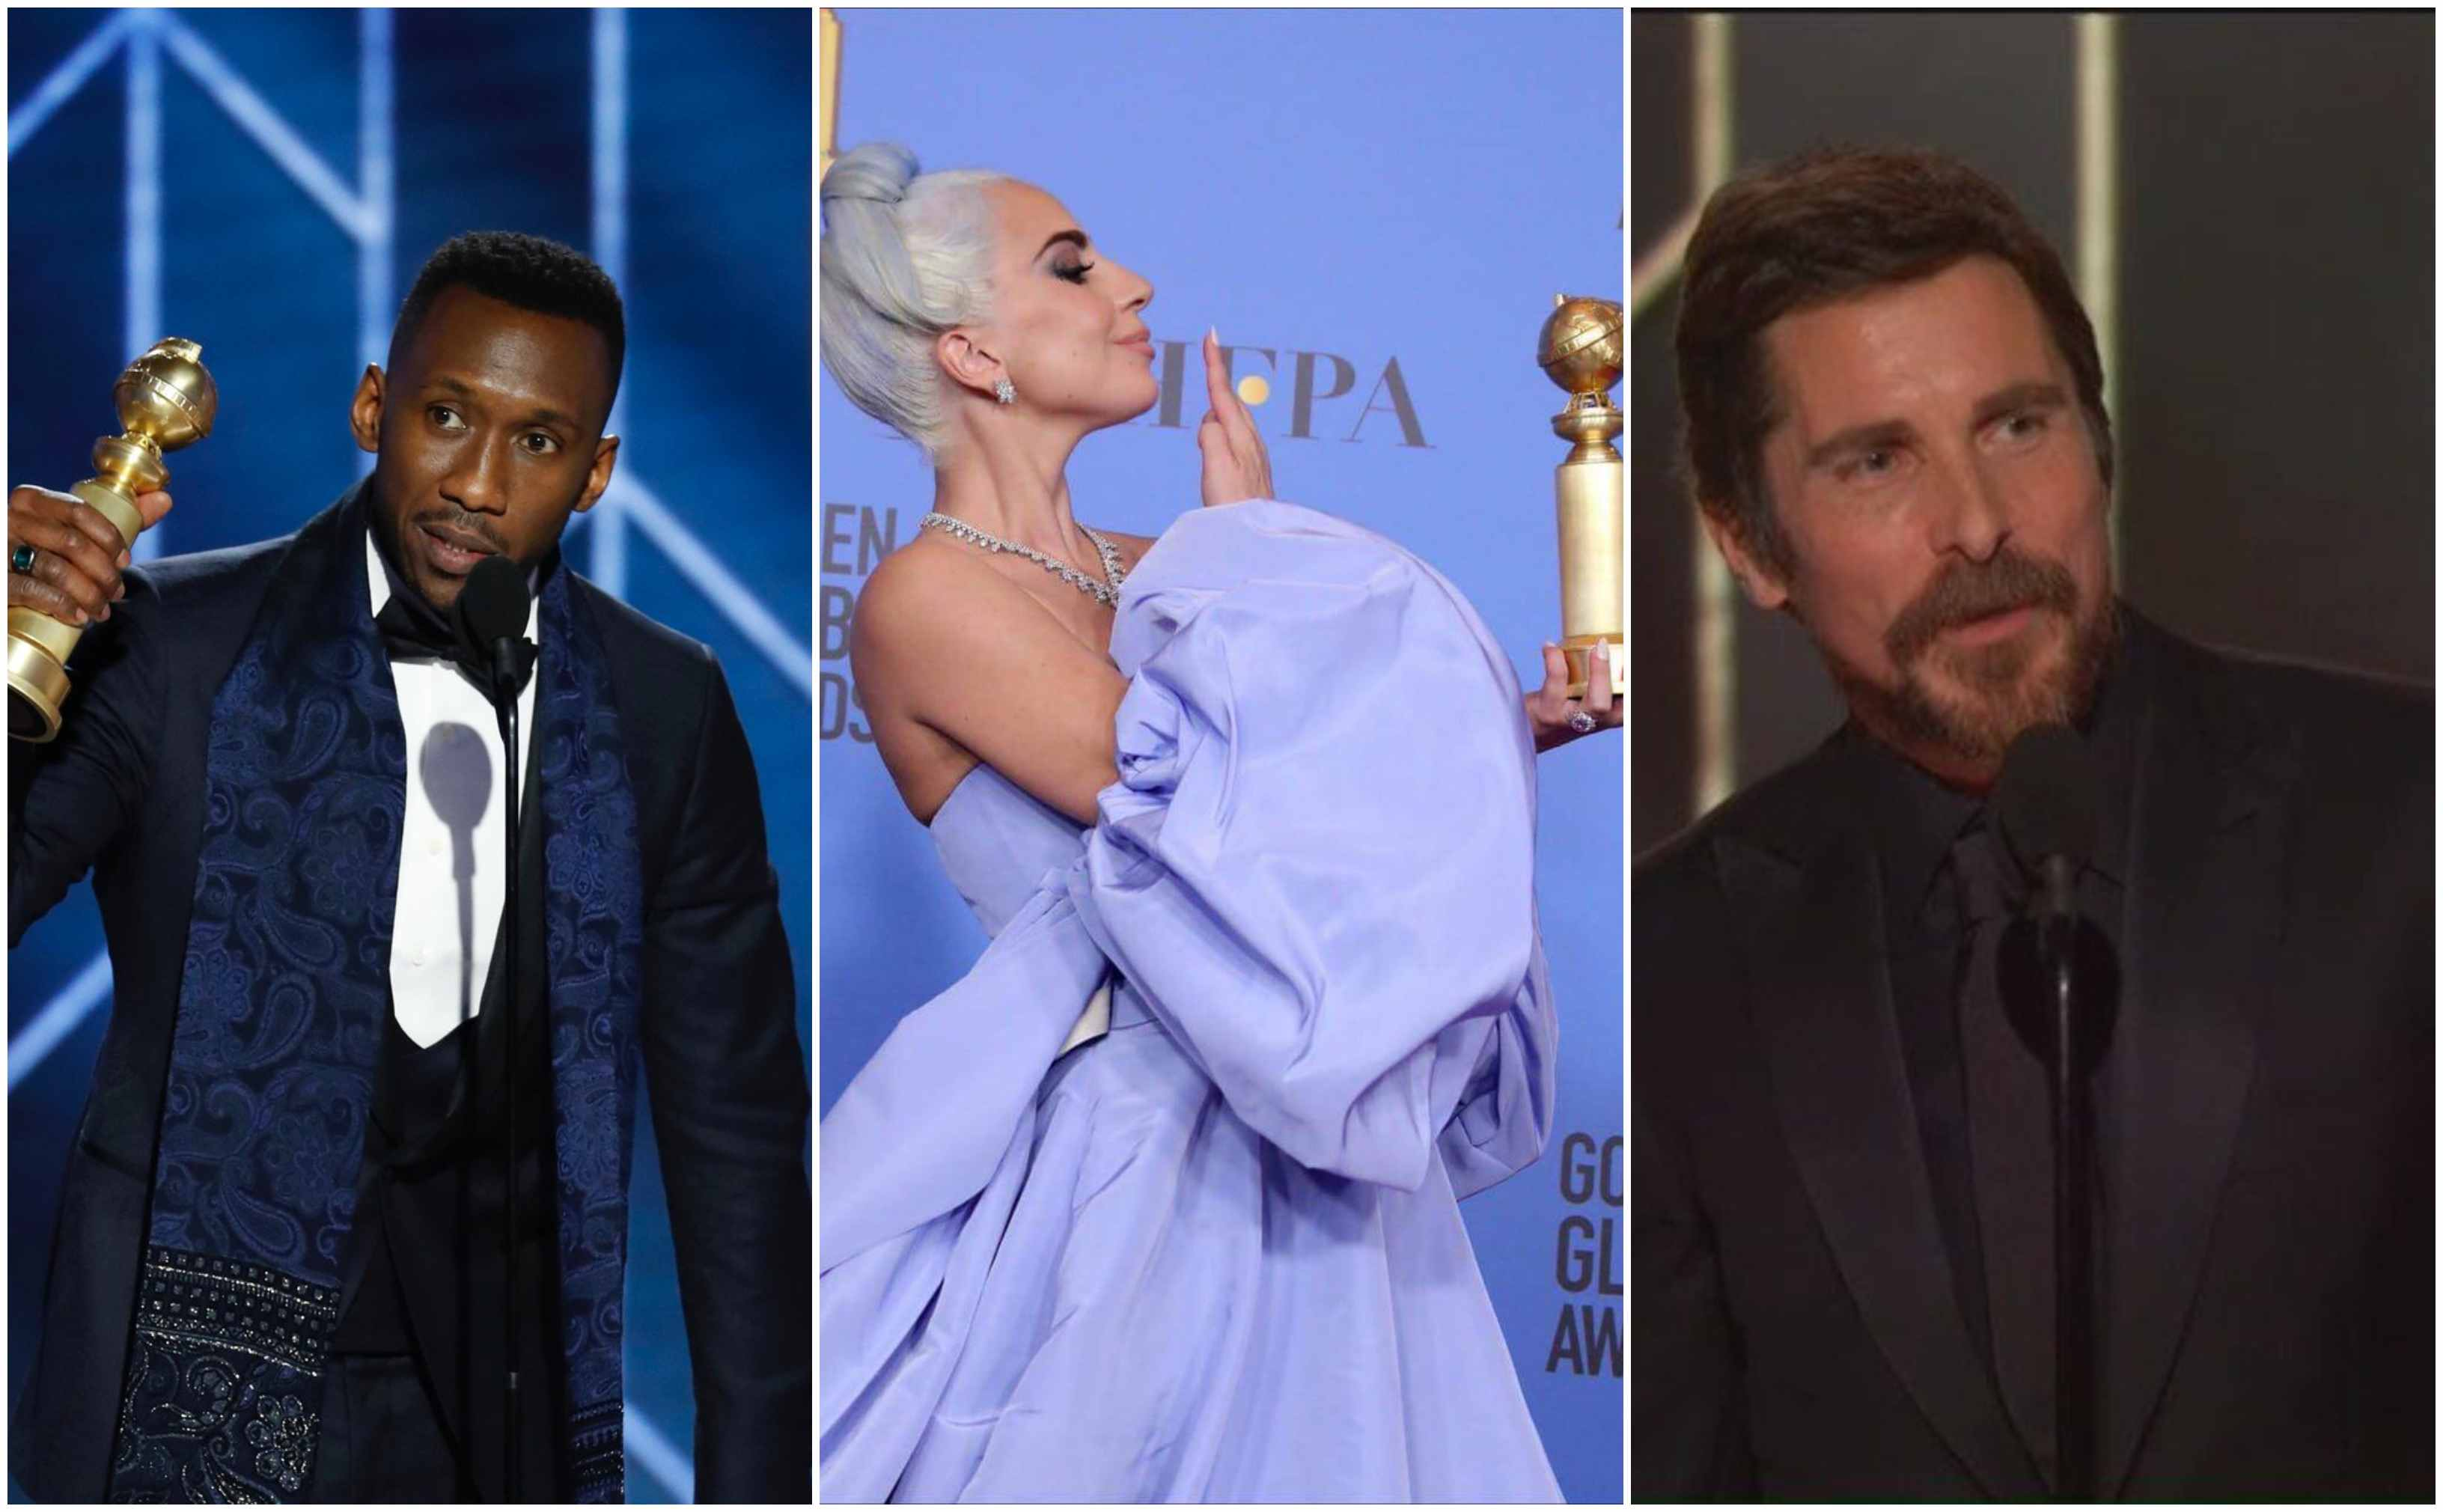 Hollywood, Bradley Cooper, Lady Gaga, Darren Criss, Christian Bale, Vice, Mahershala Ali, Green Book, Taylor Swift, Entertainment, NewsMobile, Mobile, News, India